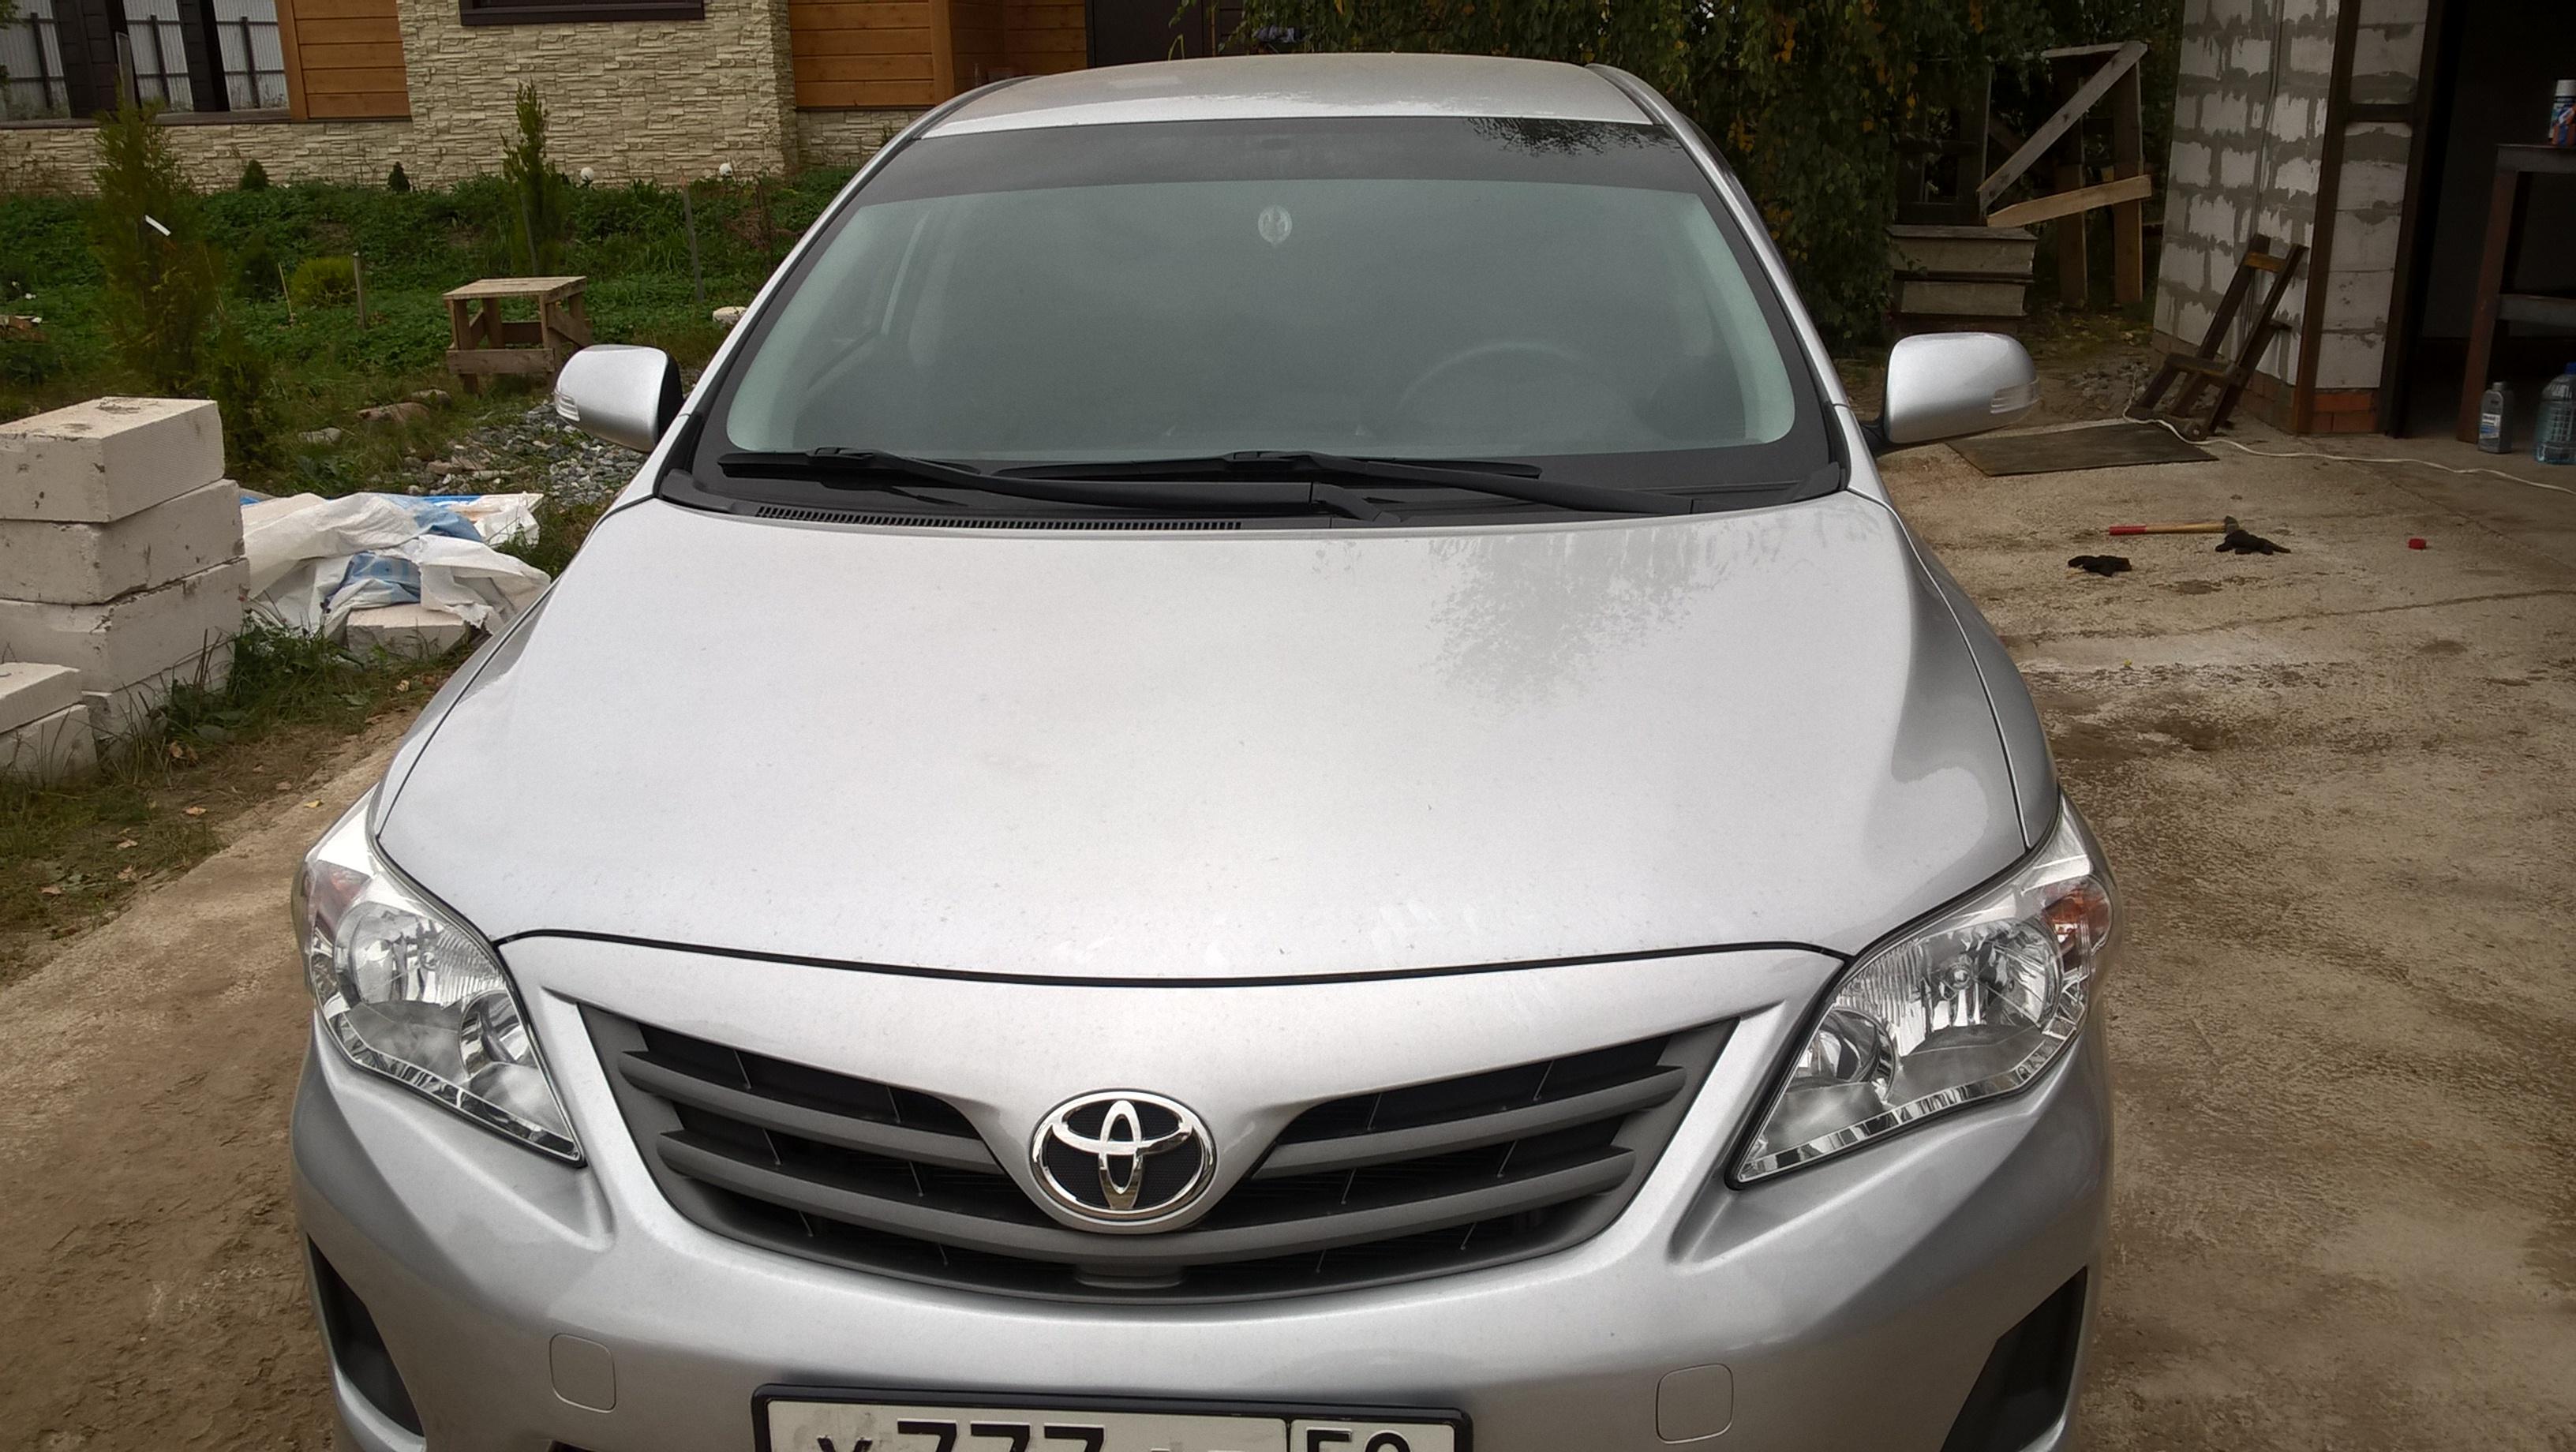 Чип тюнинг Toyota Corolla 1.6 VVTi